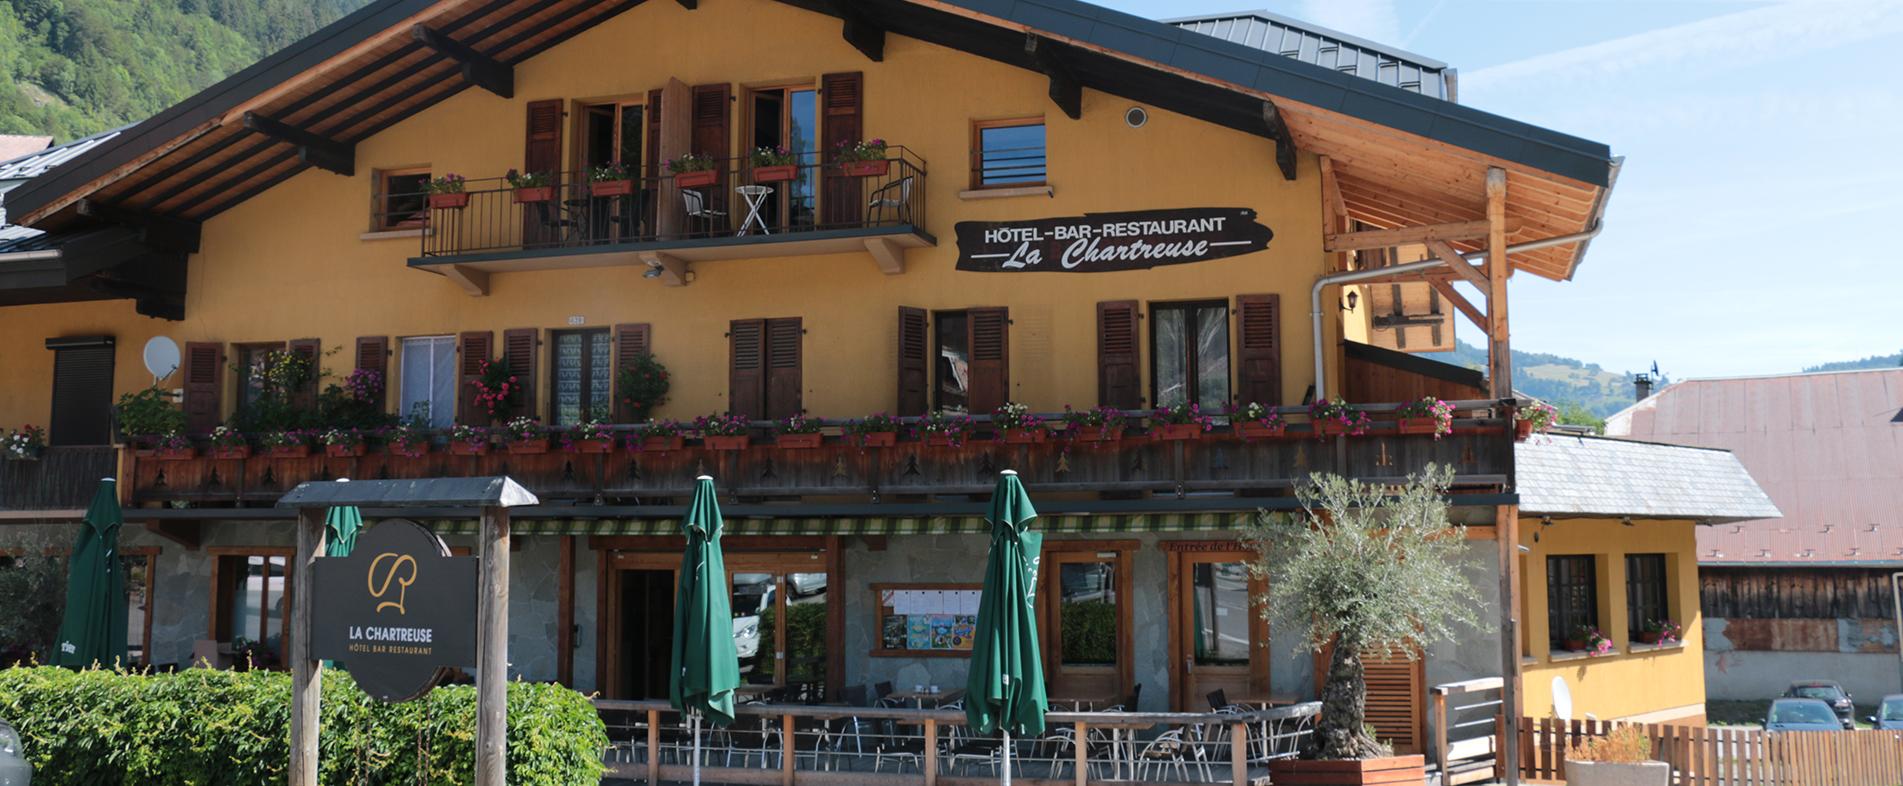 Hôtel-Restaurant La Chartreuse 1